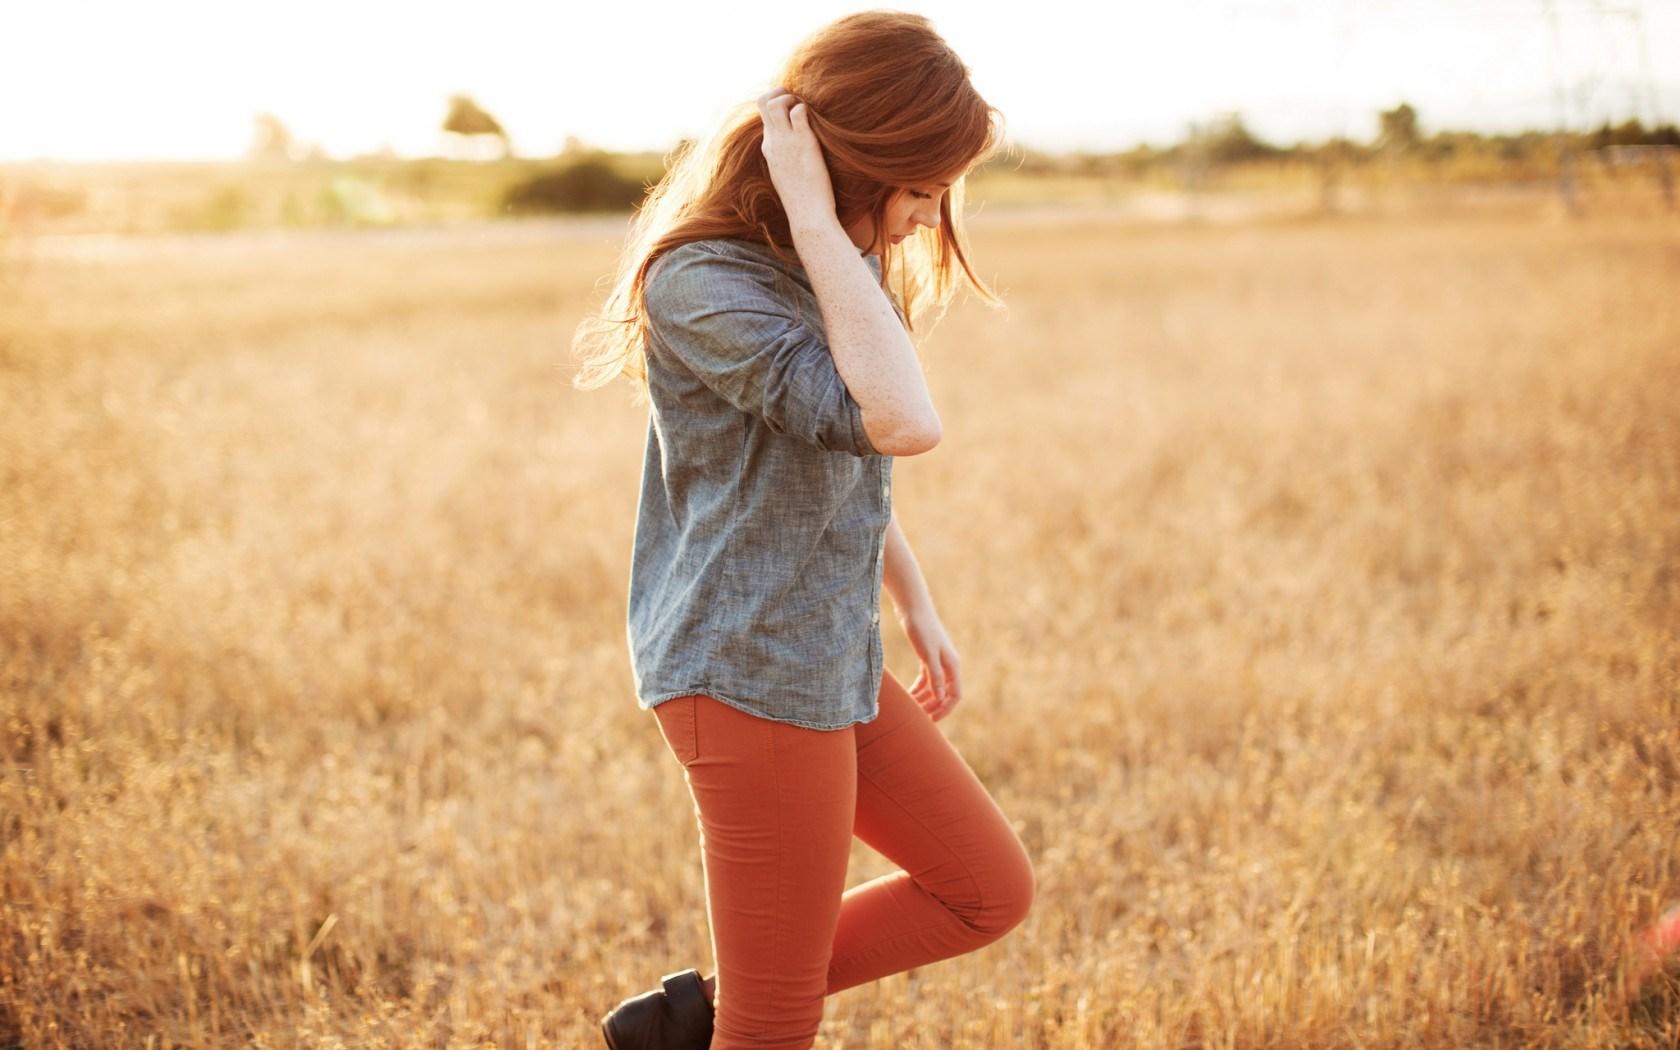 Field Redhead Girl